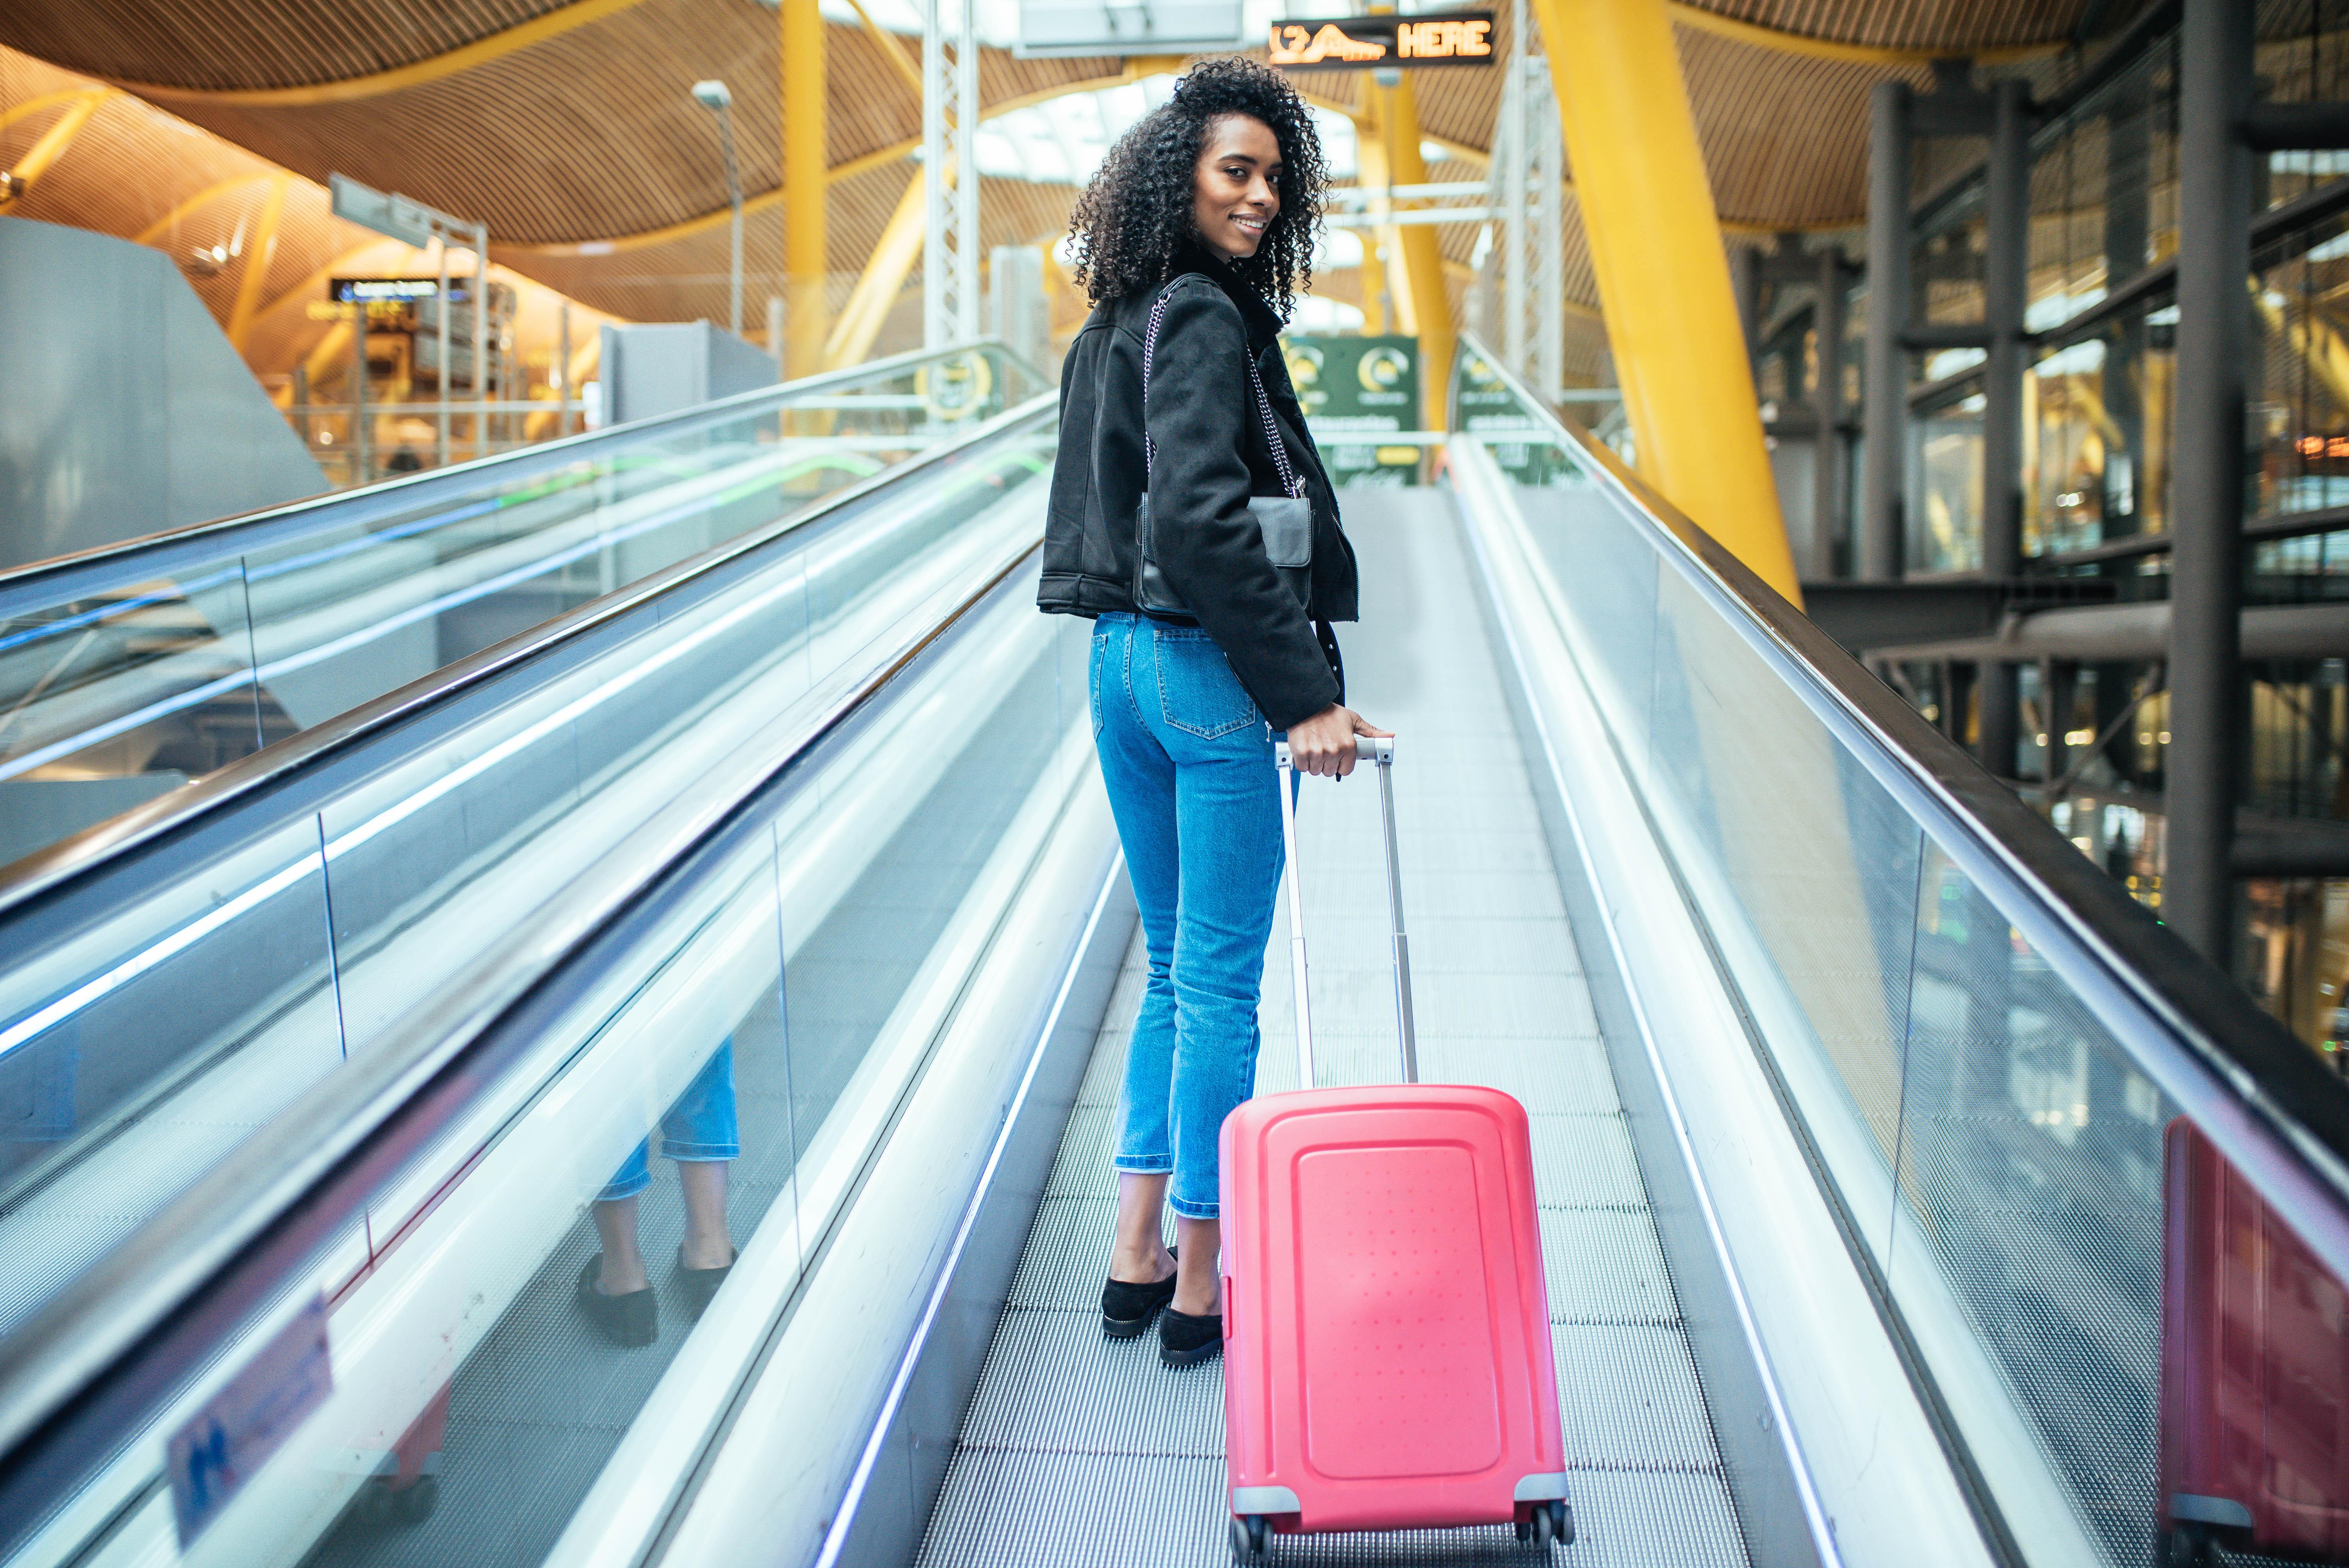 black women in airport